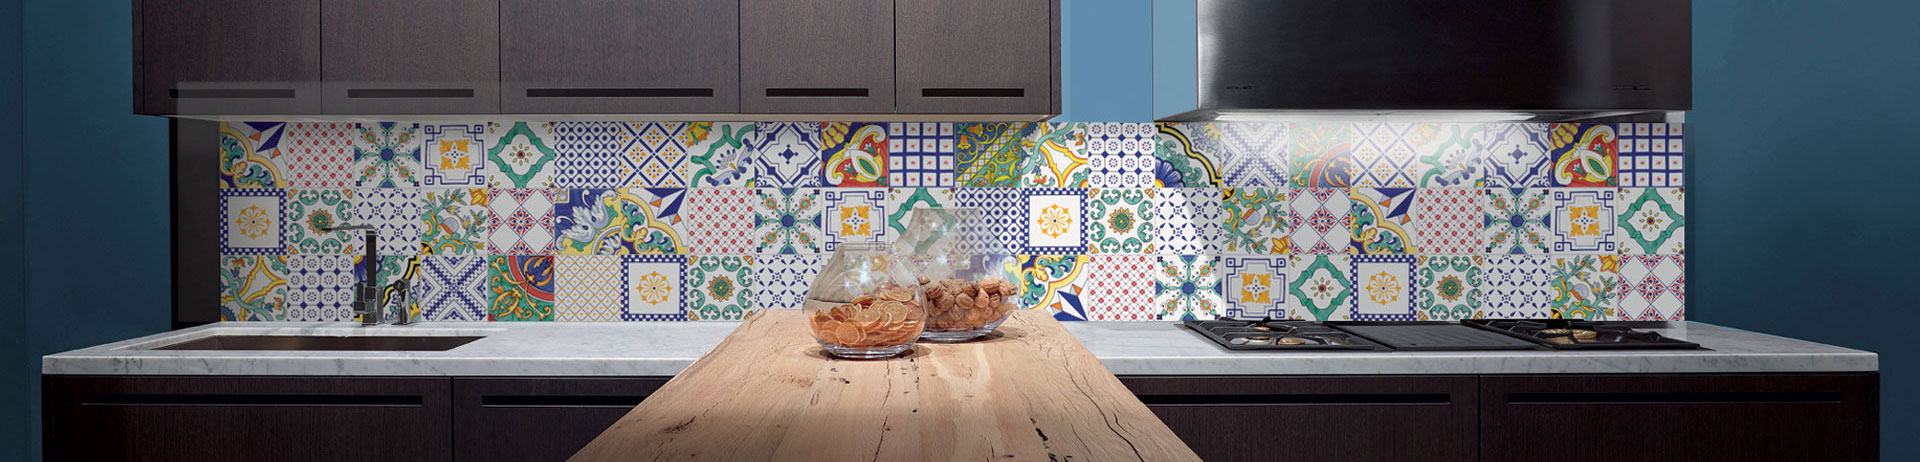 Beautiful Mattonelle Vietresi Per Cucina Photos - Ideas & Design ...